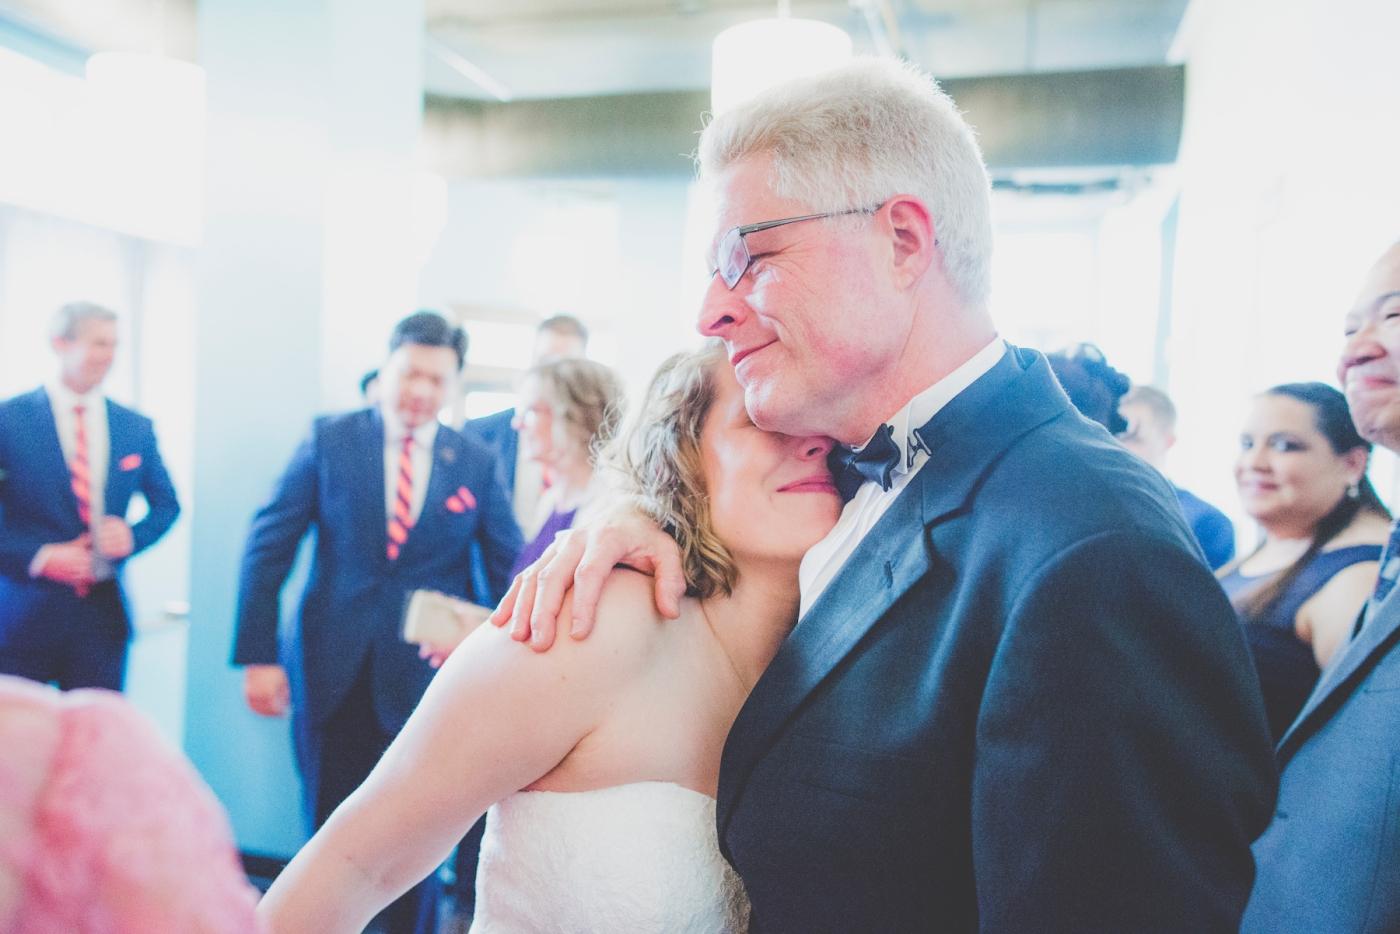 DSC_2792Everett_Wedding_Ballroom_Jane_Speleers_photography_Rachel_and_Edmund_Ceremony_2017